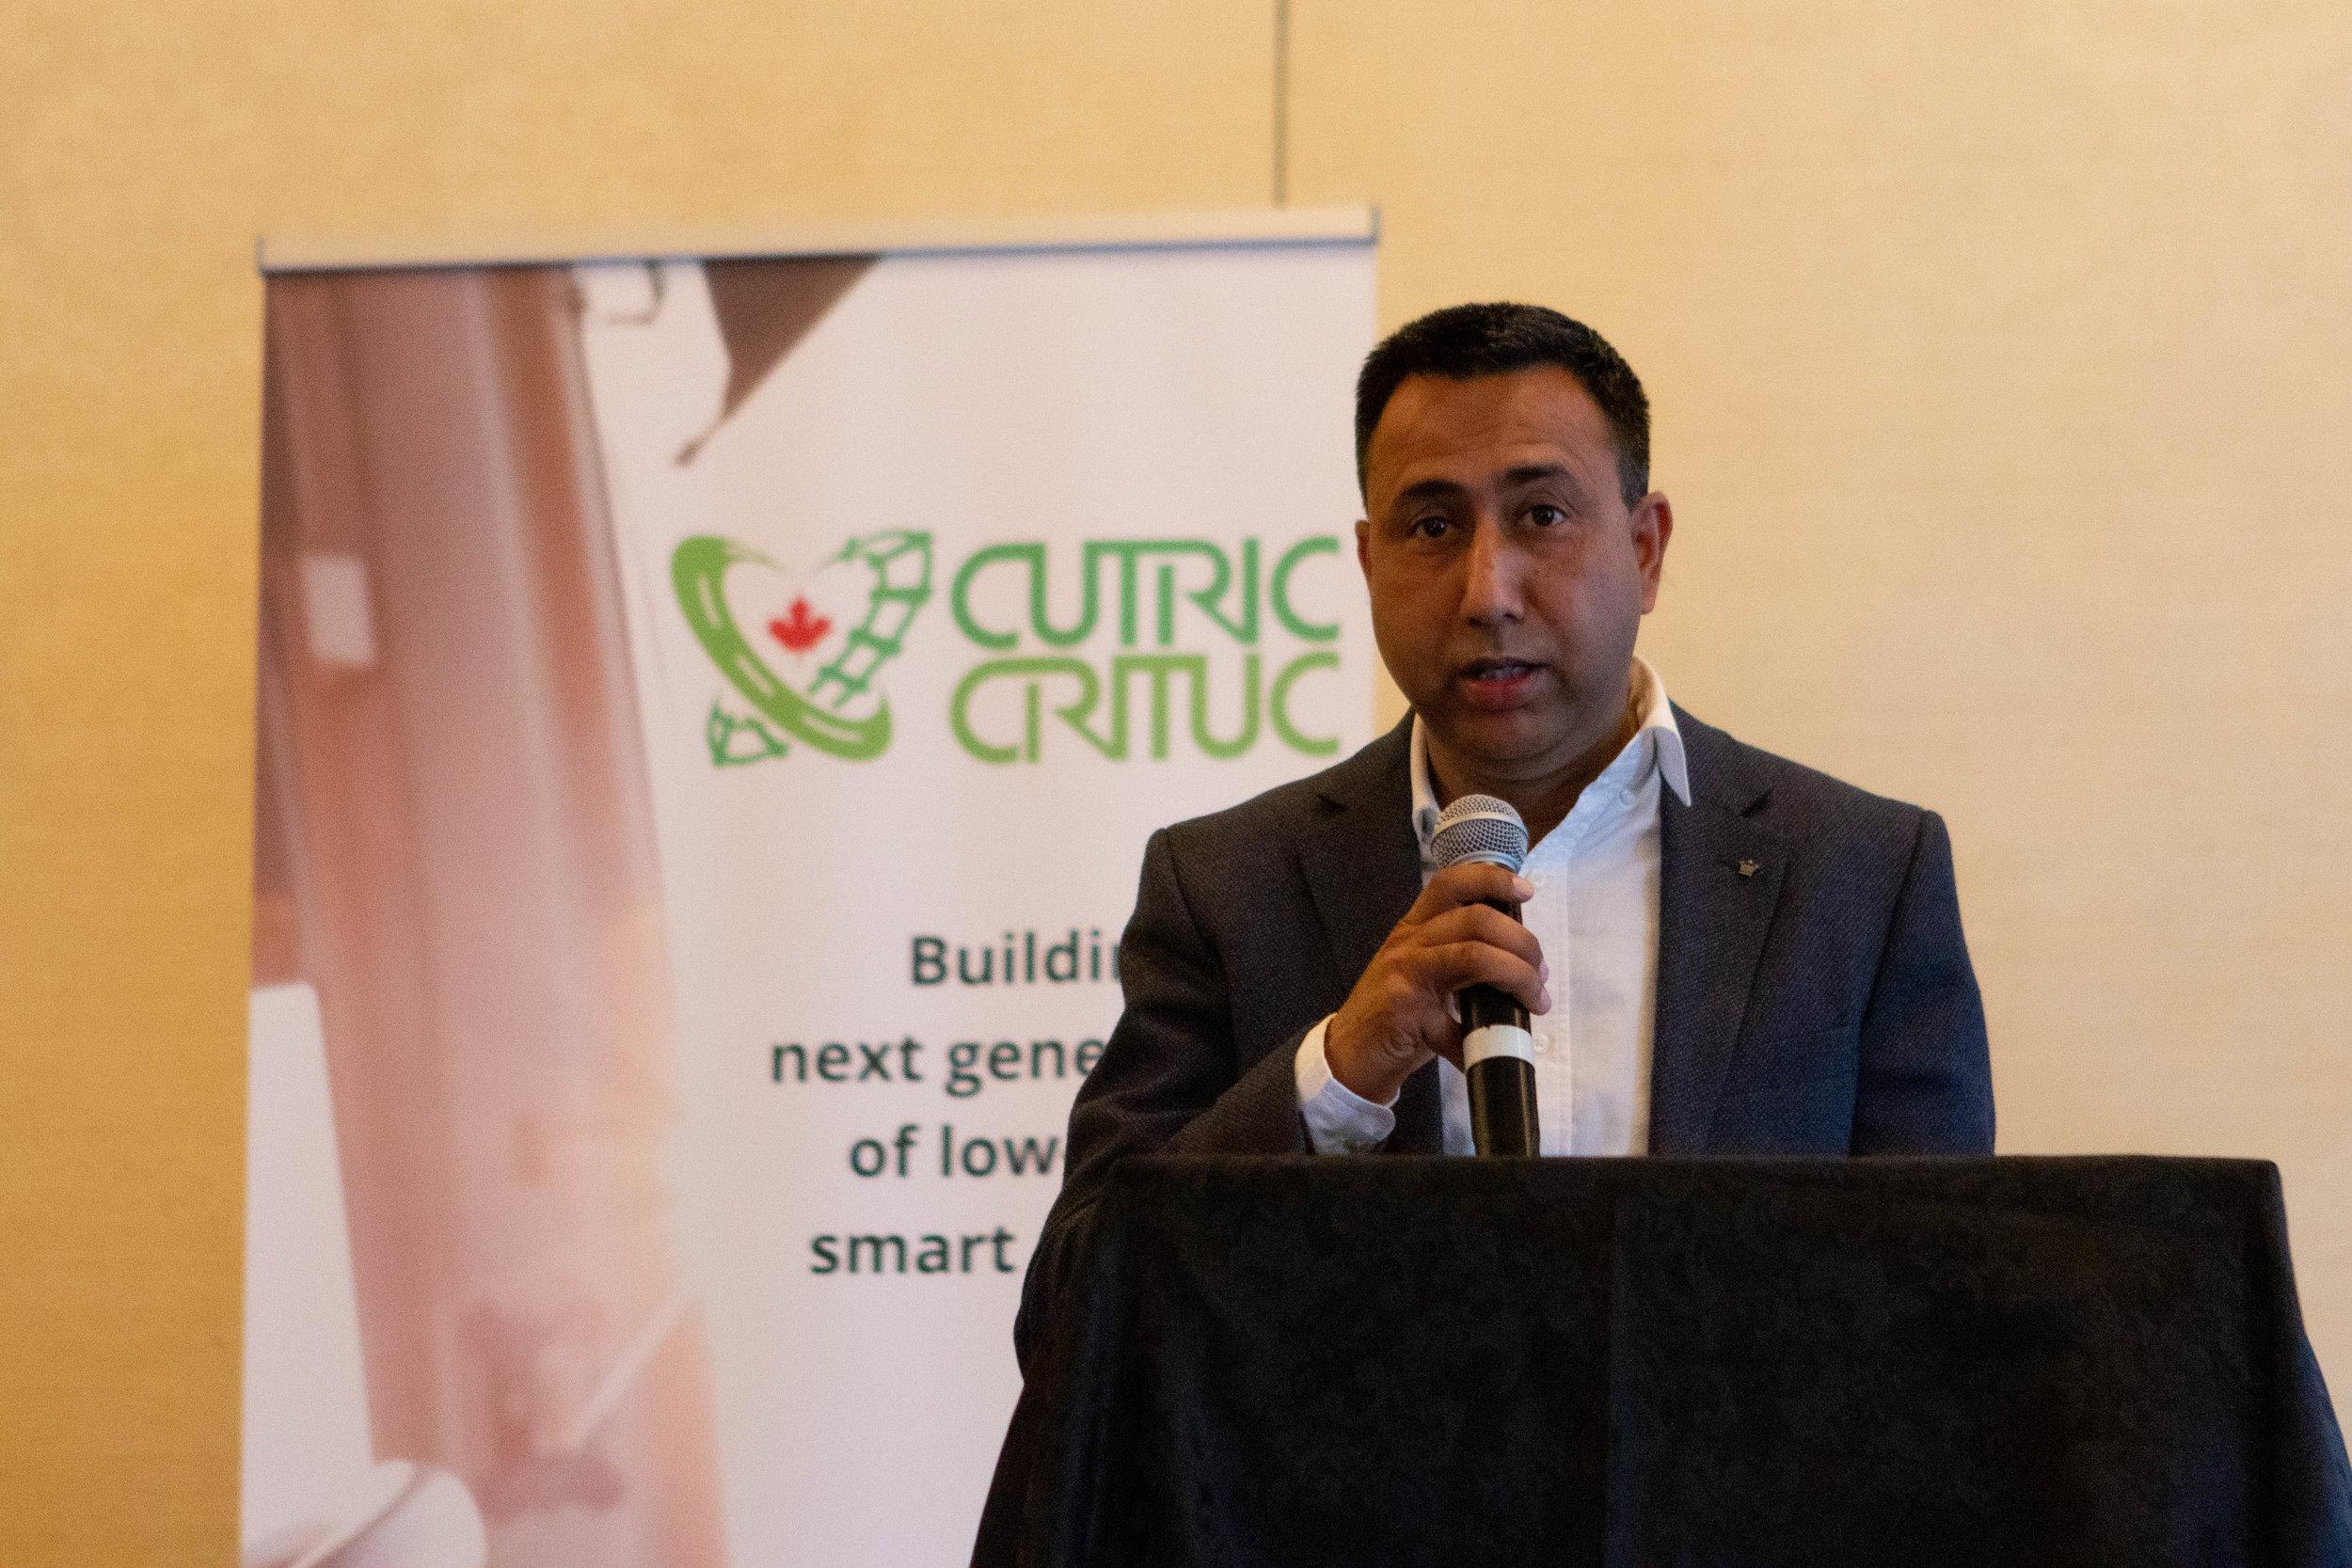 Deepak Anand - Member of Provincial Parliament for Mississauga – Malton.